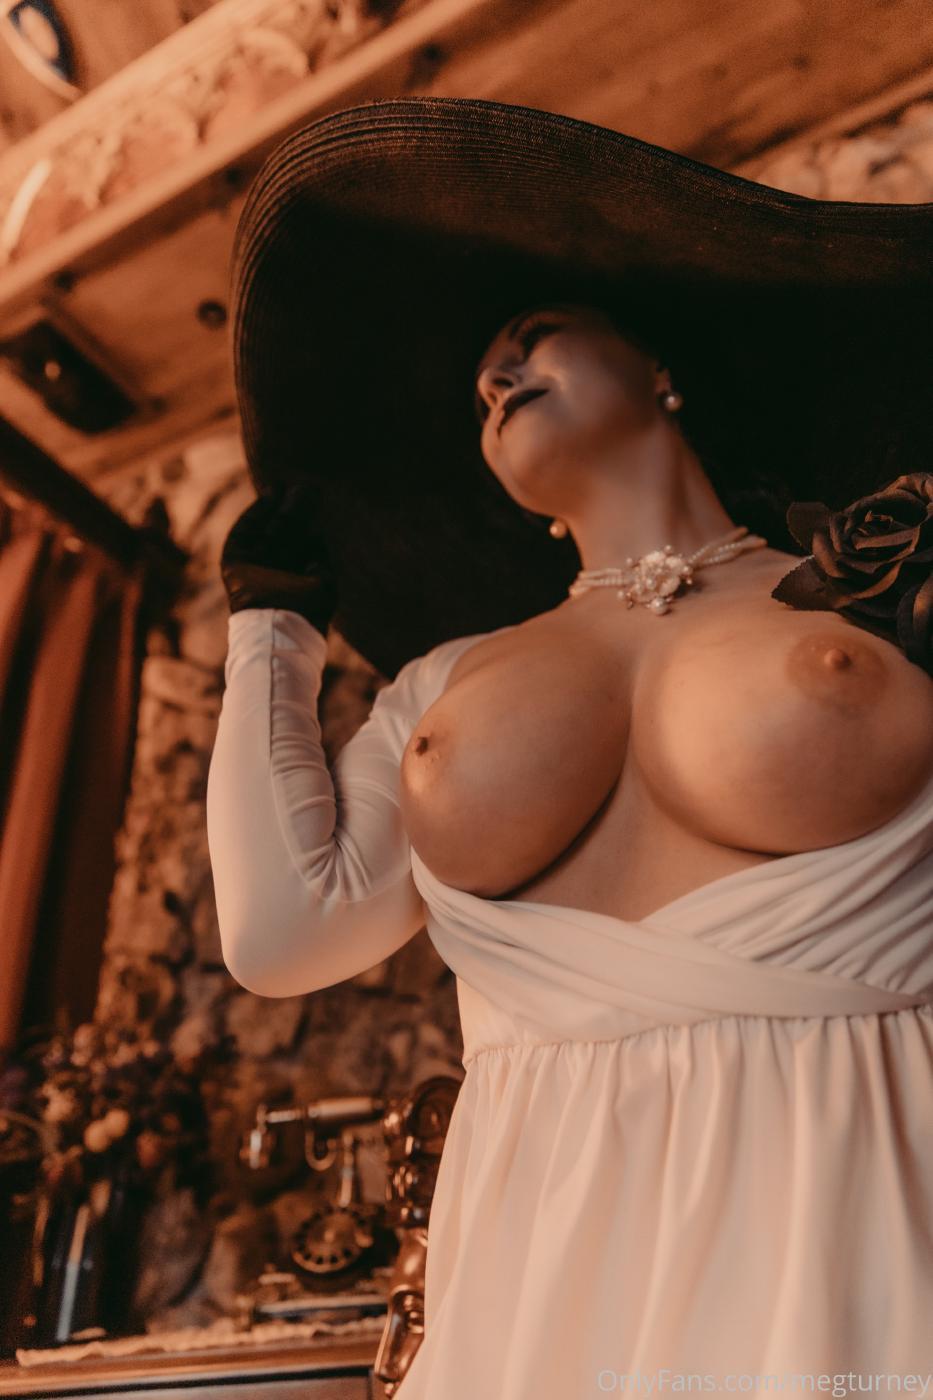 Meg Turney Lady Dimitrescu Cosplay Onlyfans Set Leaked 0051